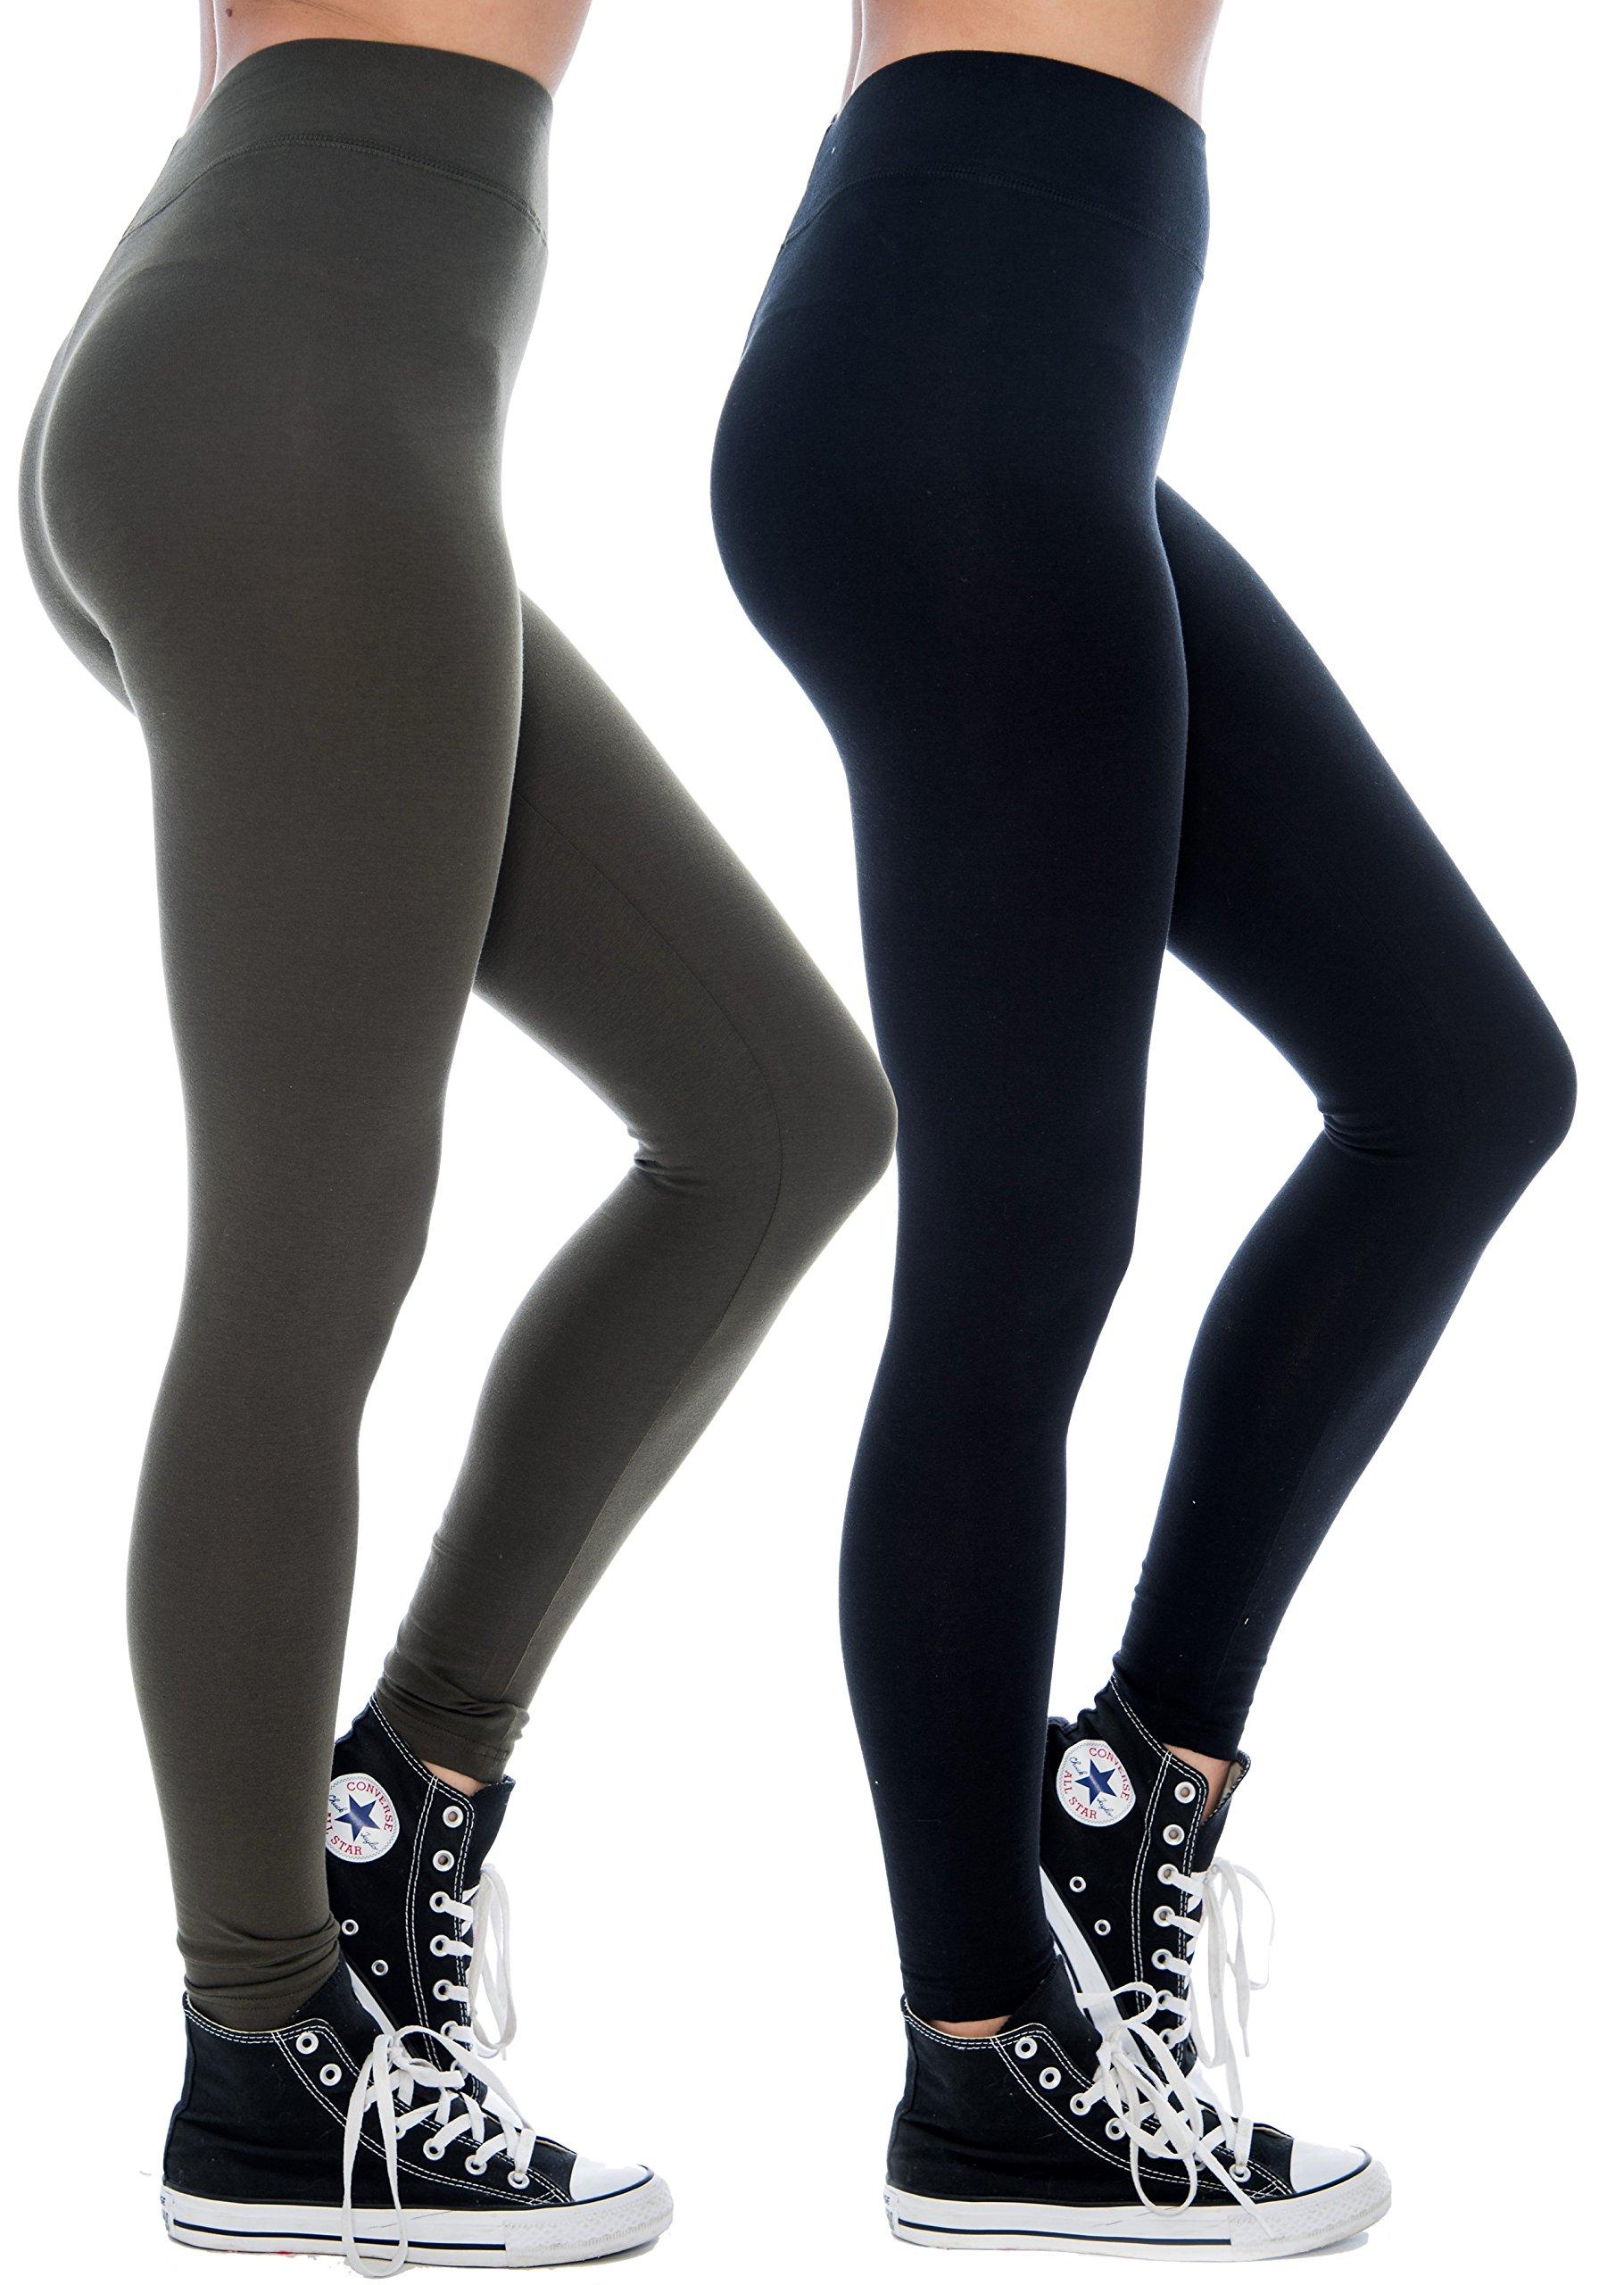 Unique Styles Cotton Leggings for Women Breathable Soft Active Yoga Pants (Small, Black/Olive)